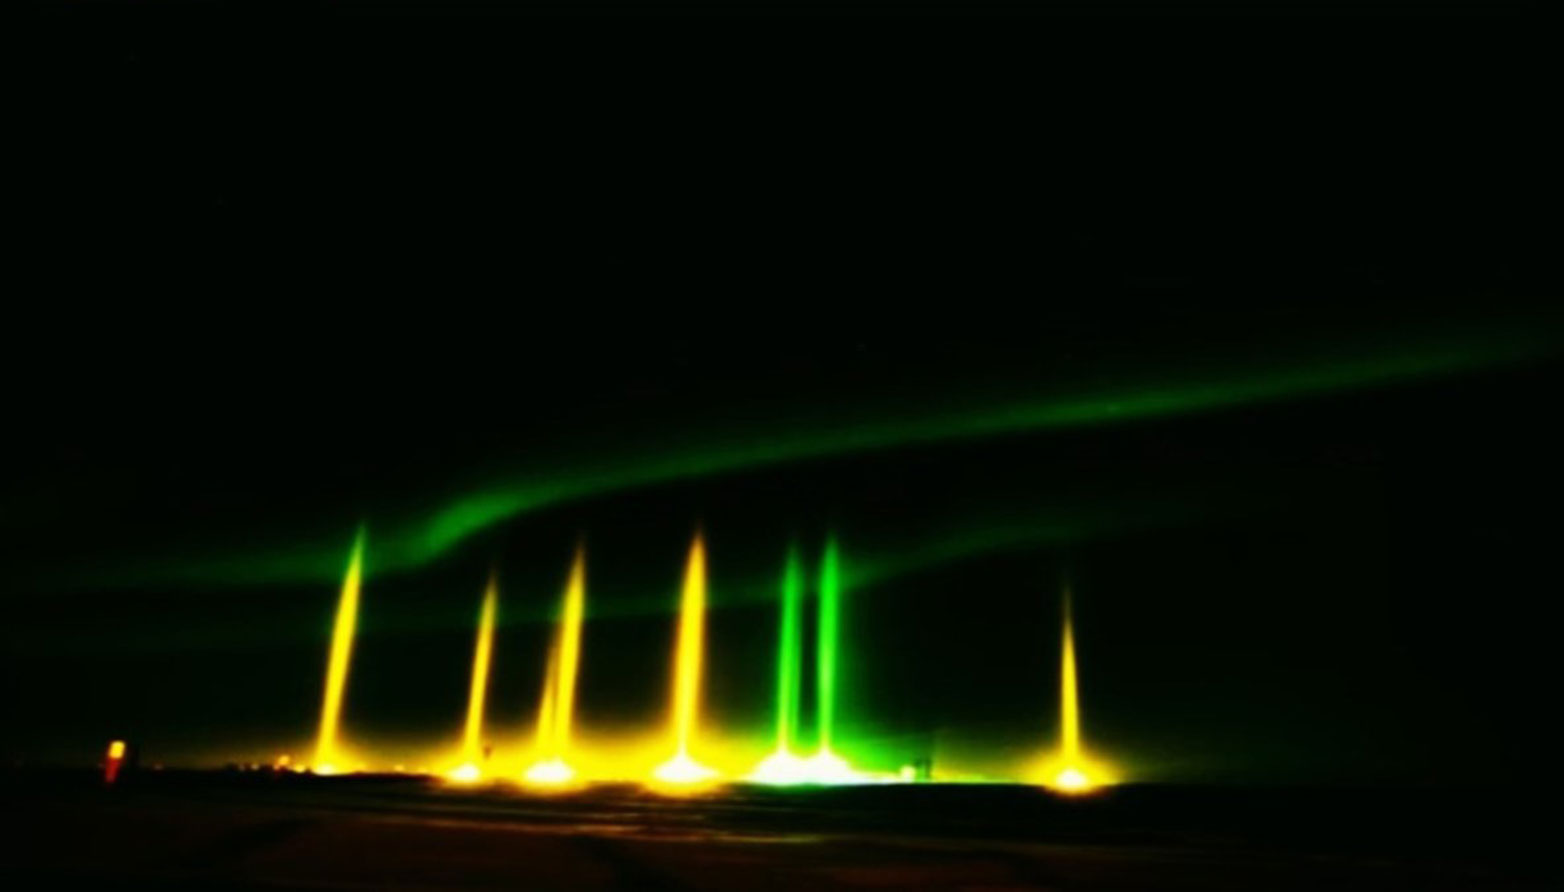 Pilares de luz